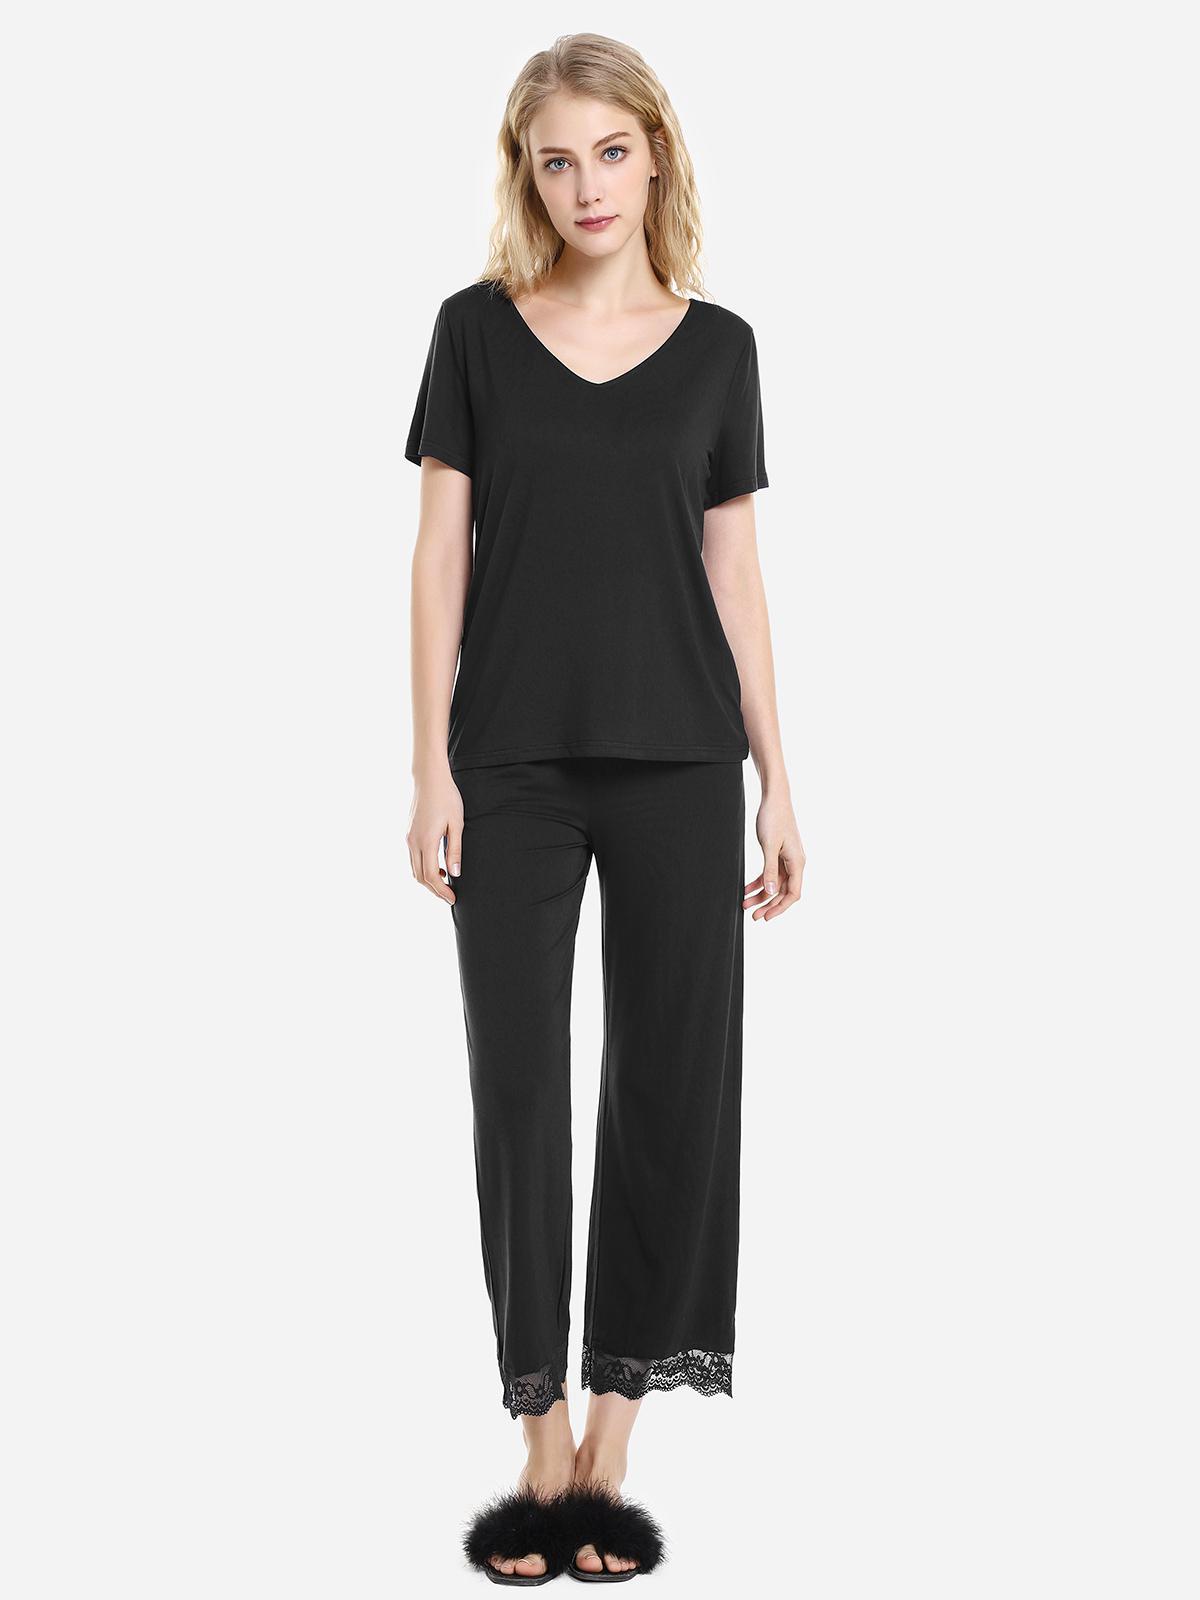 ZAN.STYLE V Neck Sleepwear Short Sleeve Pajama Set